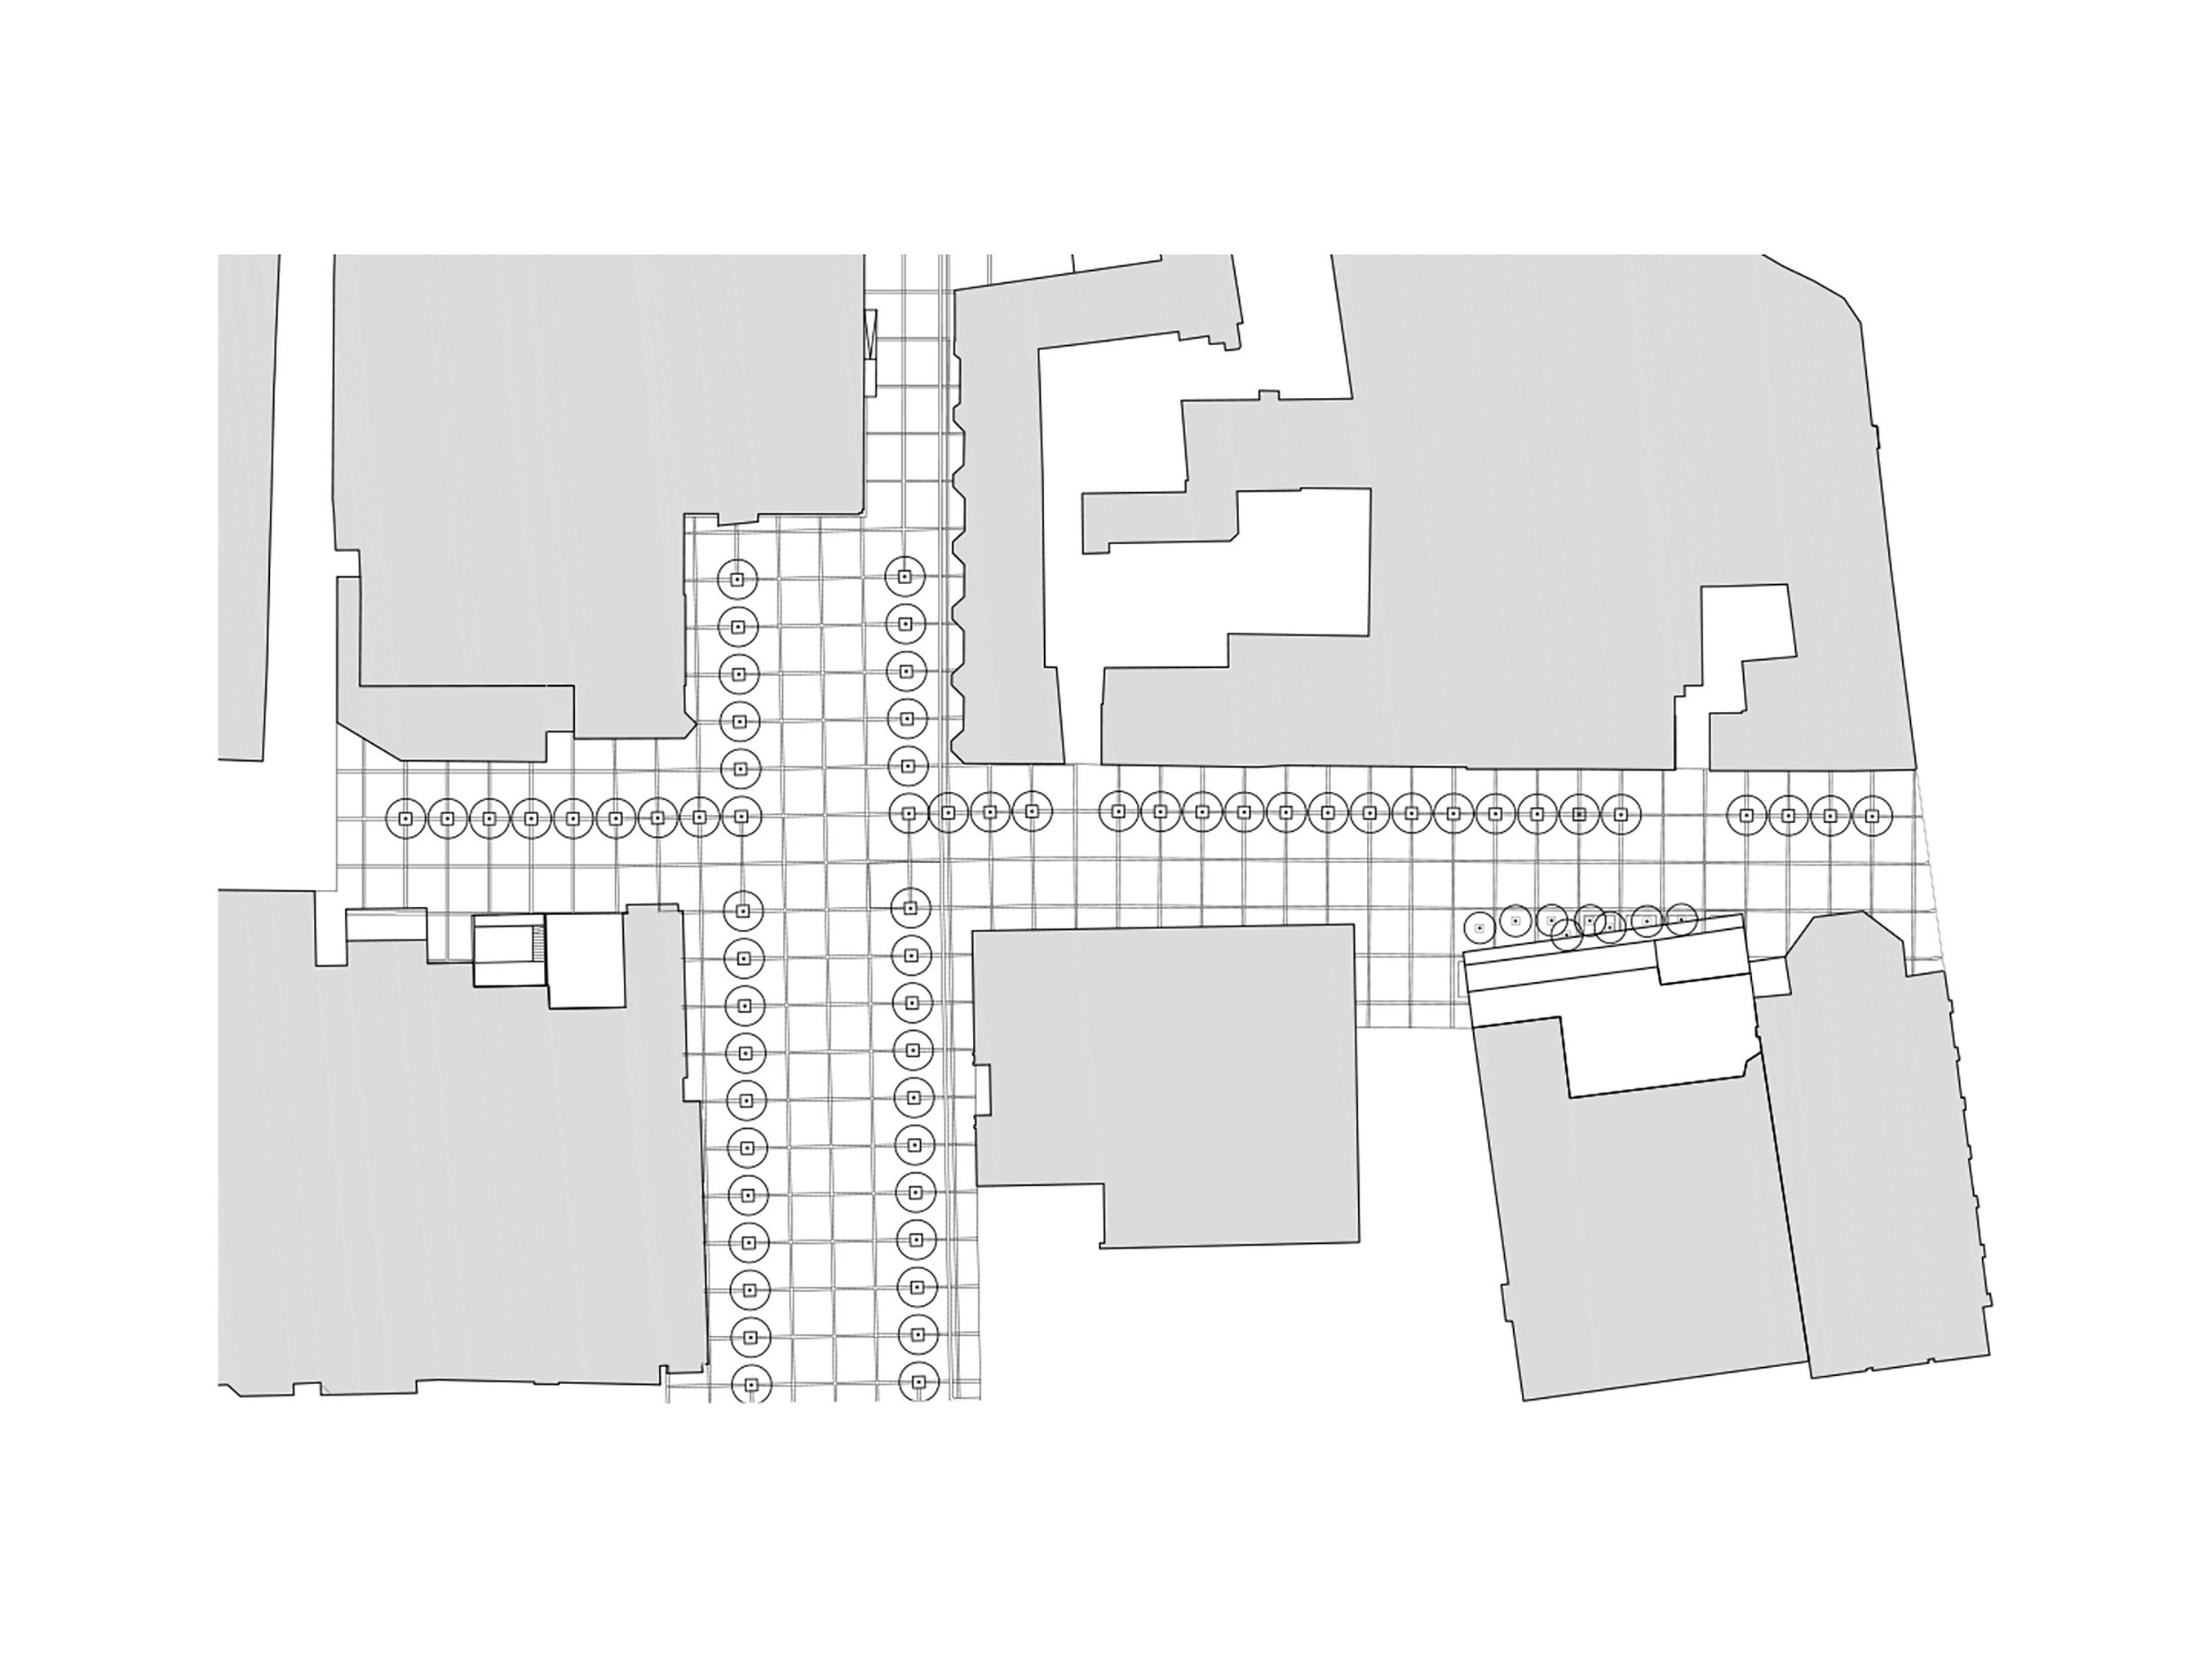 trg leon stukelj maribor bruto square urban tree line drevored tloris plan